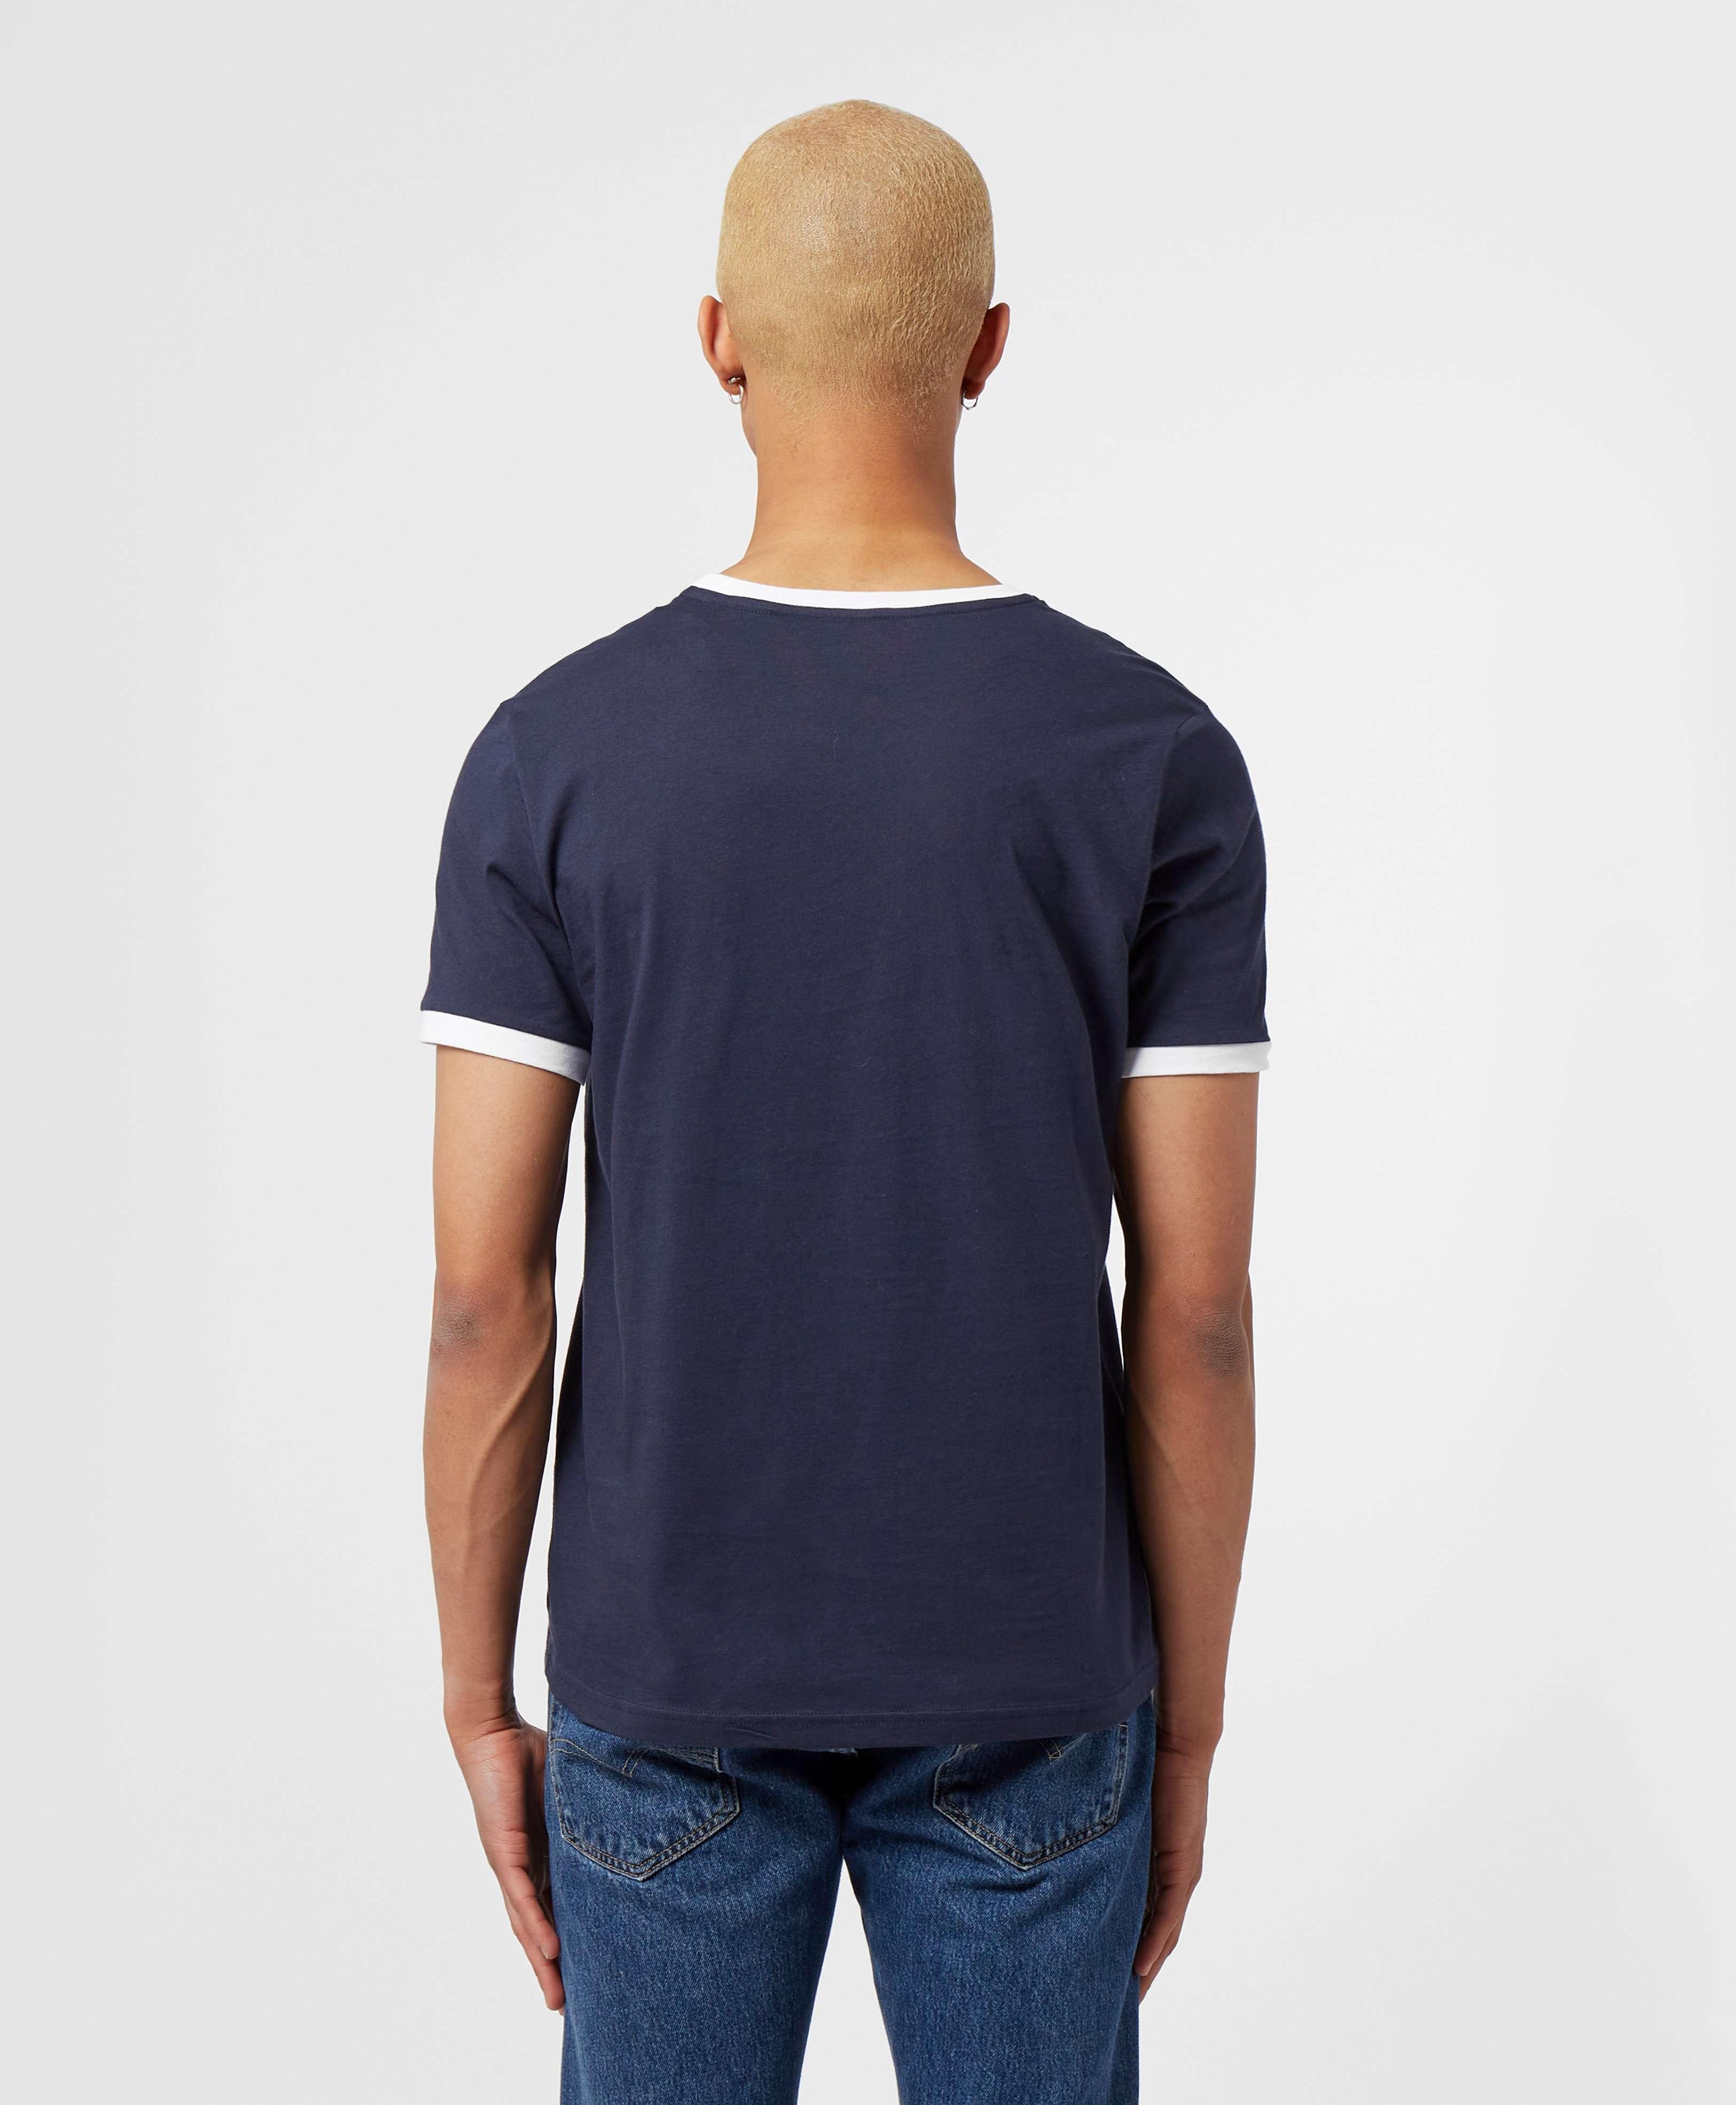 Tommy Hilfiger Logo Block Short Sleeve T-Shirt